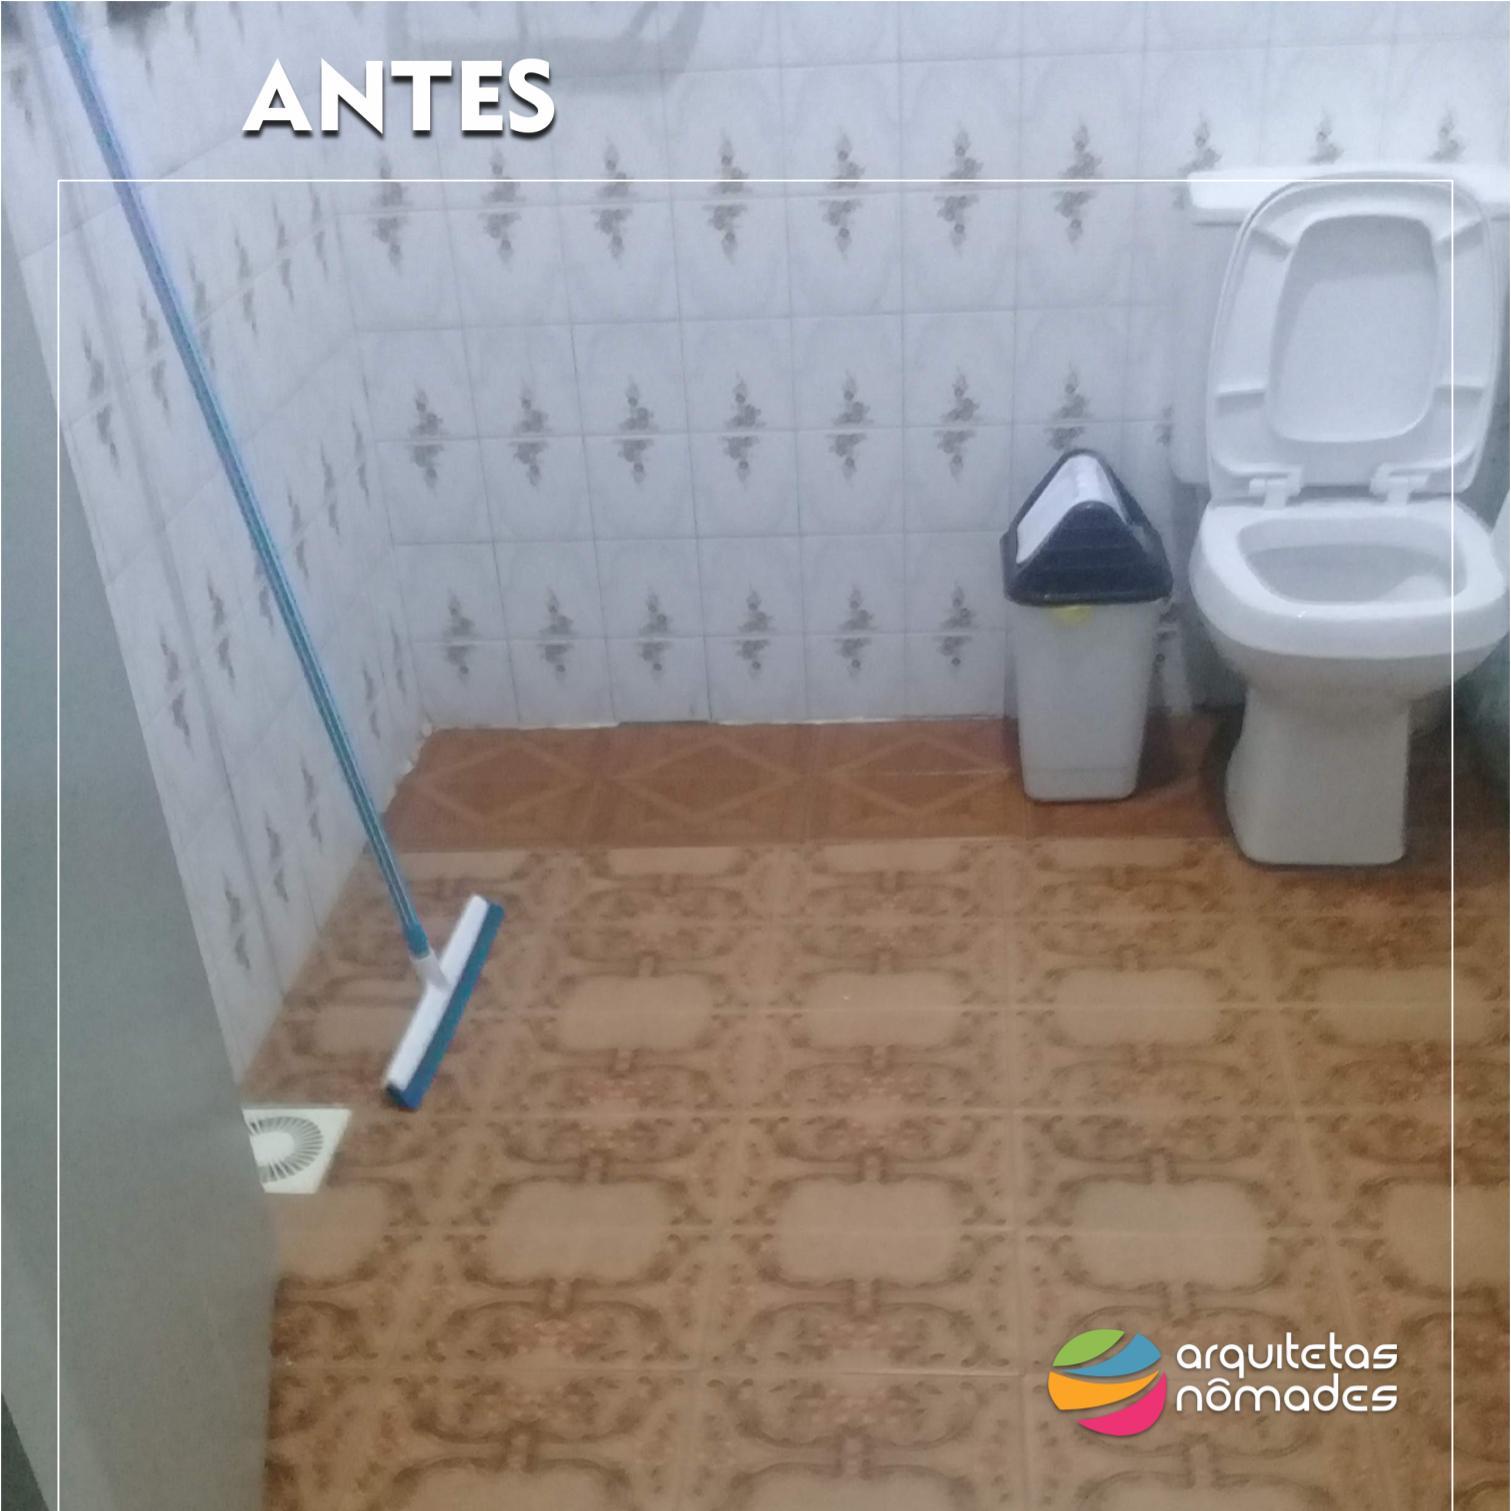 ANTES3-katia